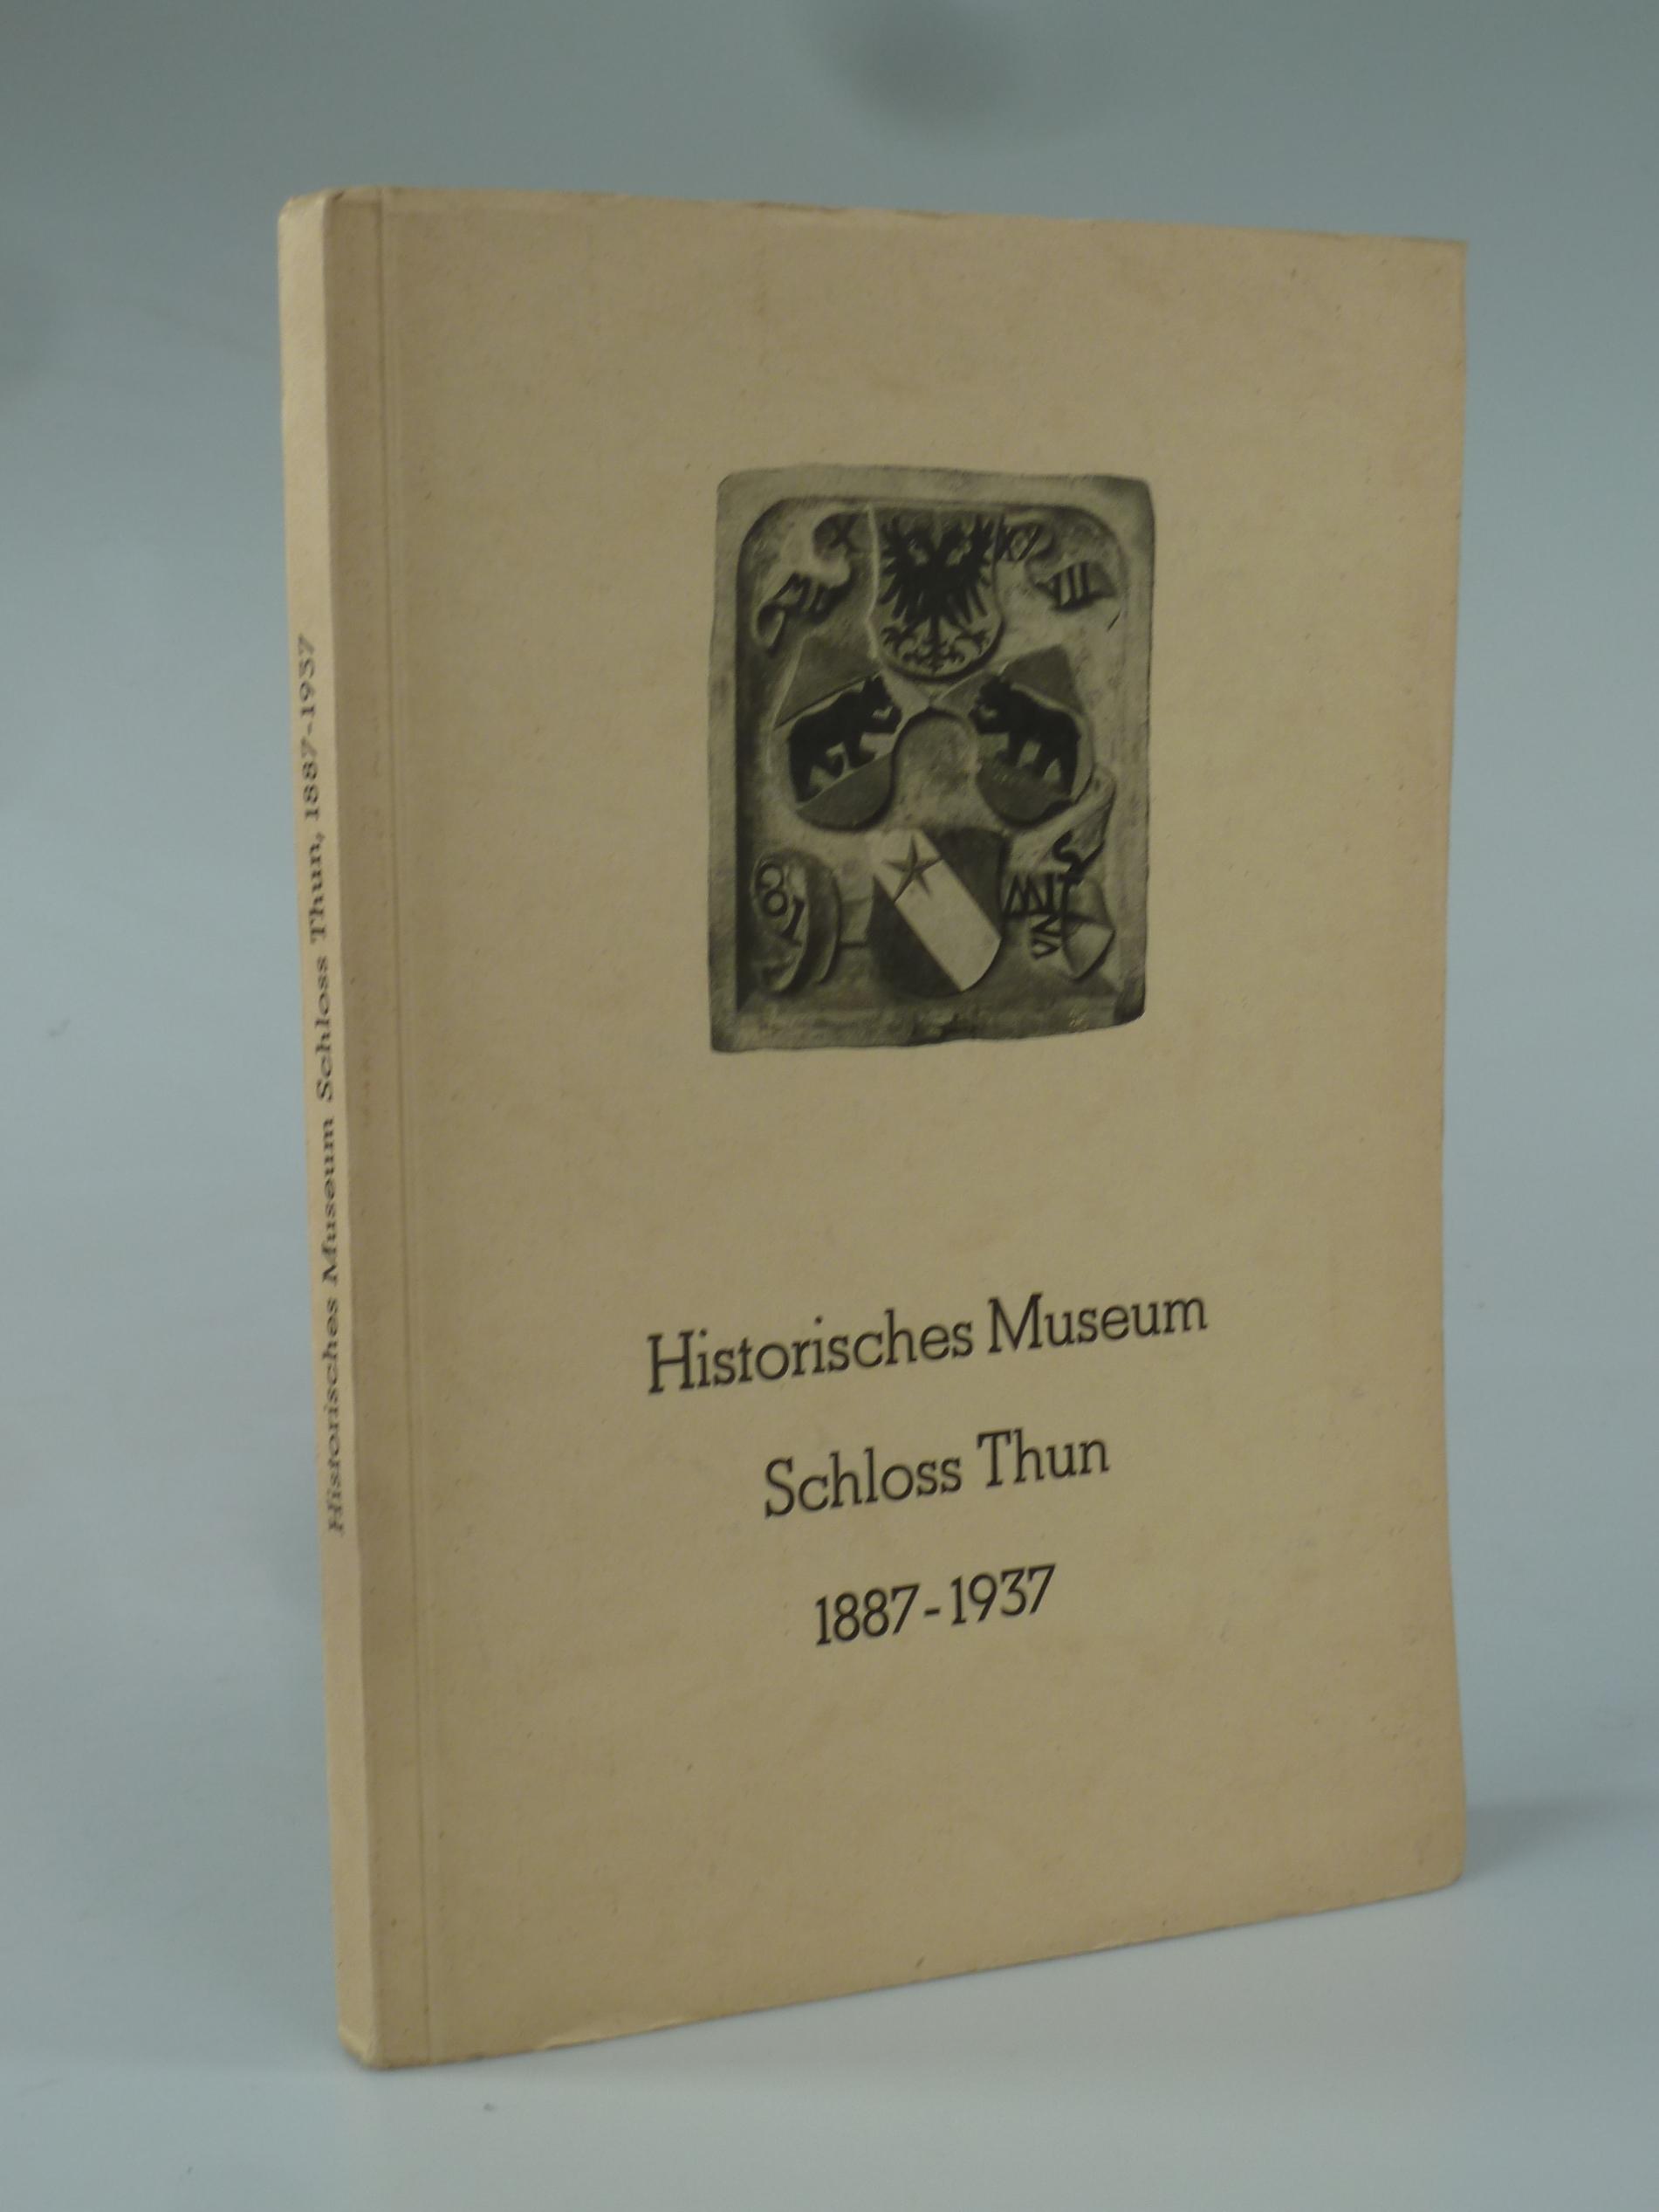 Das Historische Museum im Schloss Thun 1887-1937.: KELLER, Hans Gustav.